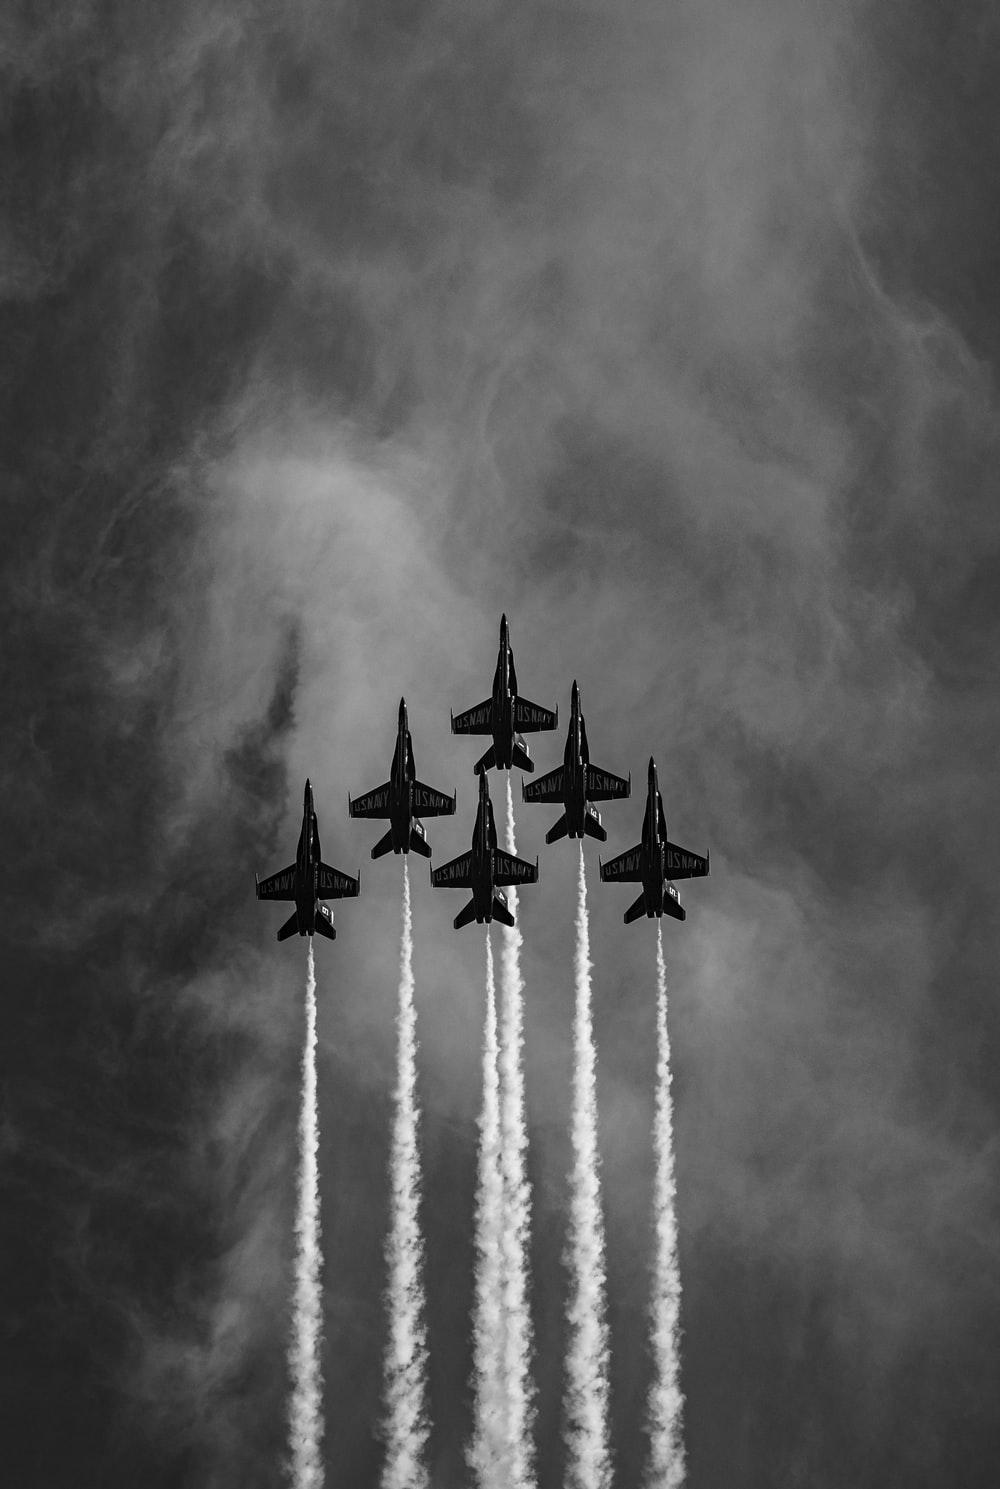 500 Fighter Jet Pictures Download Images on Unsplash 1000x1489